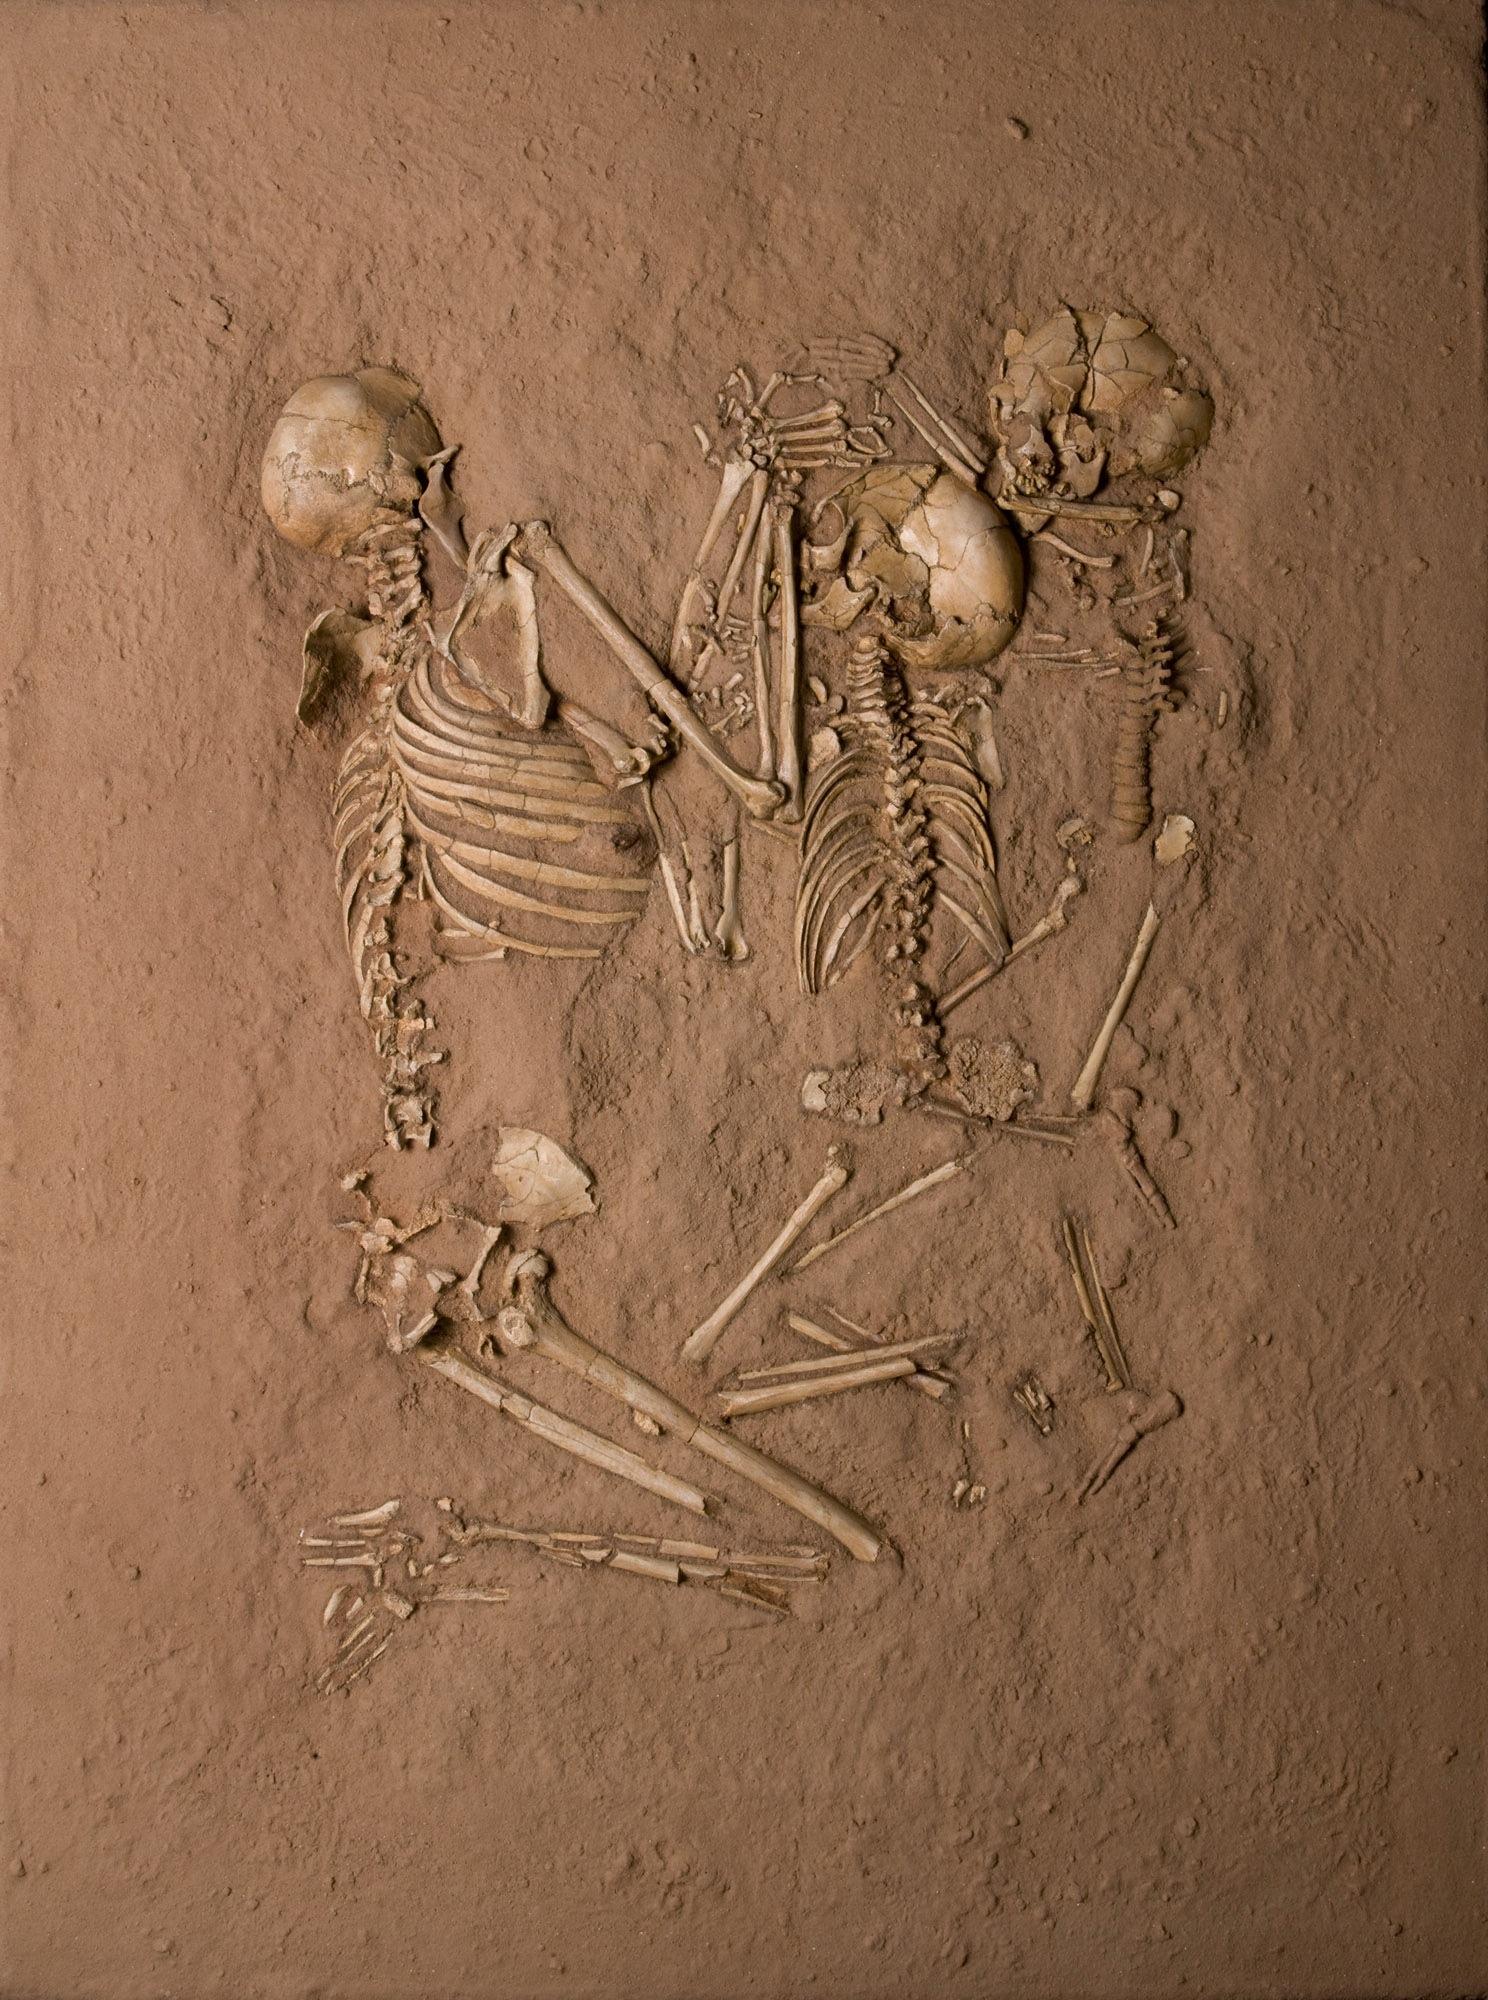 Tenerean Triple Burial, from Gobero, Niger